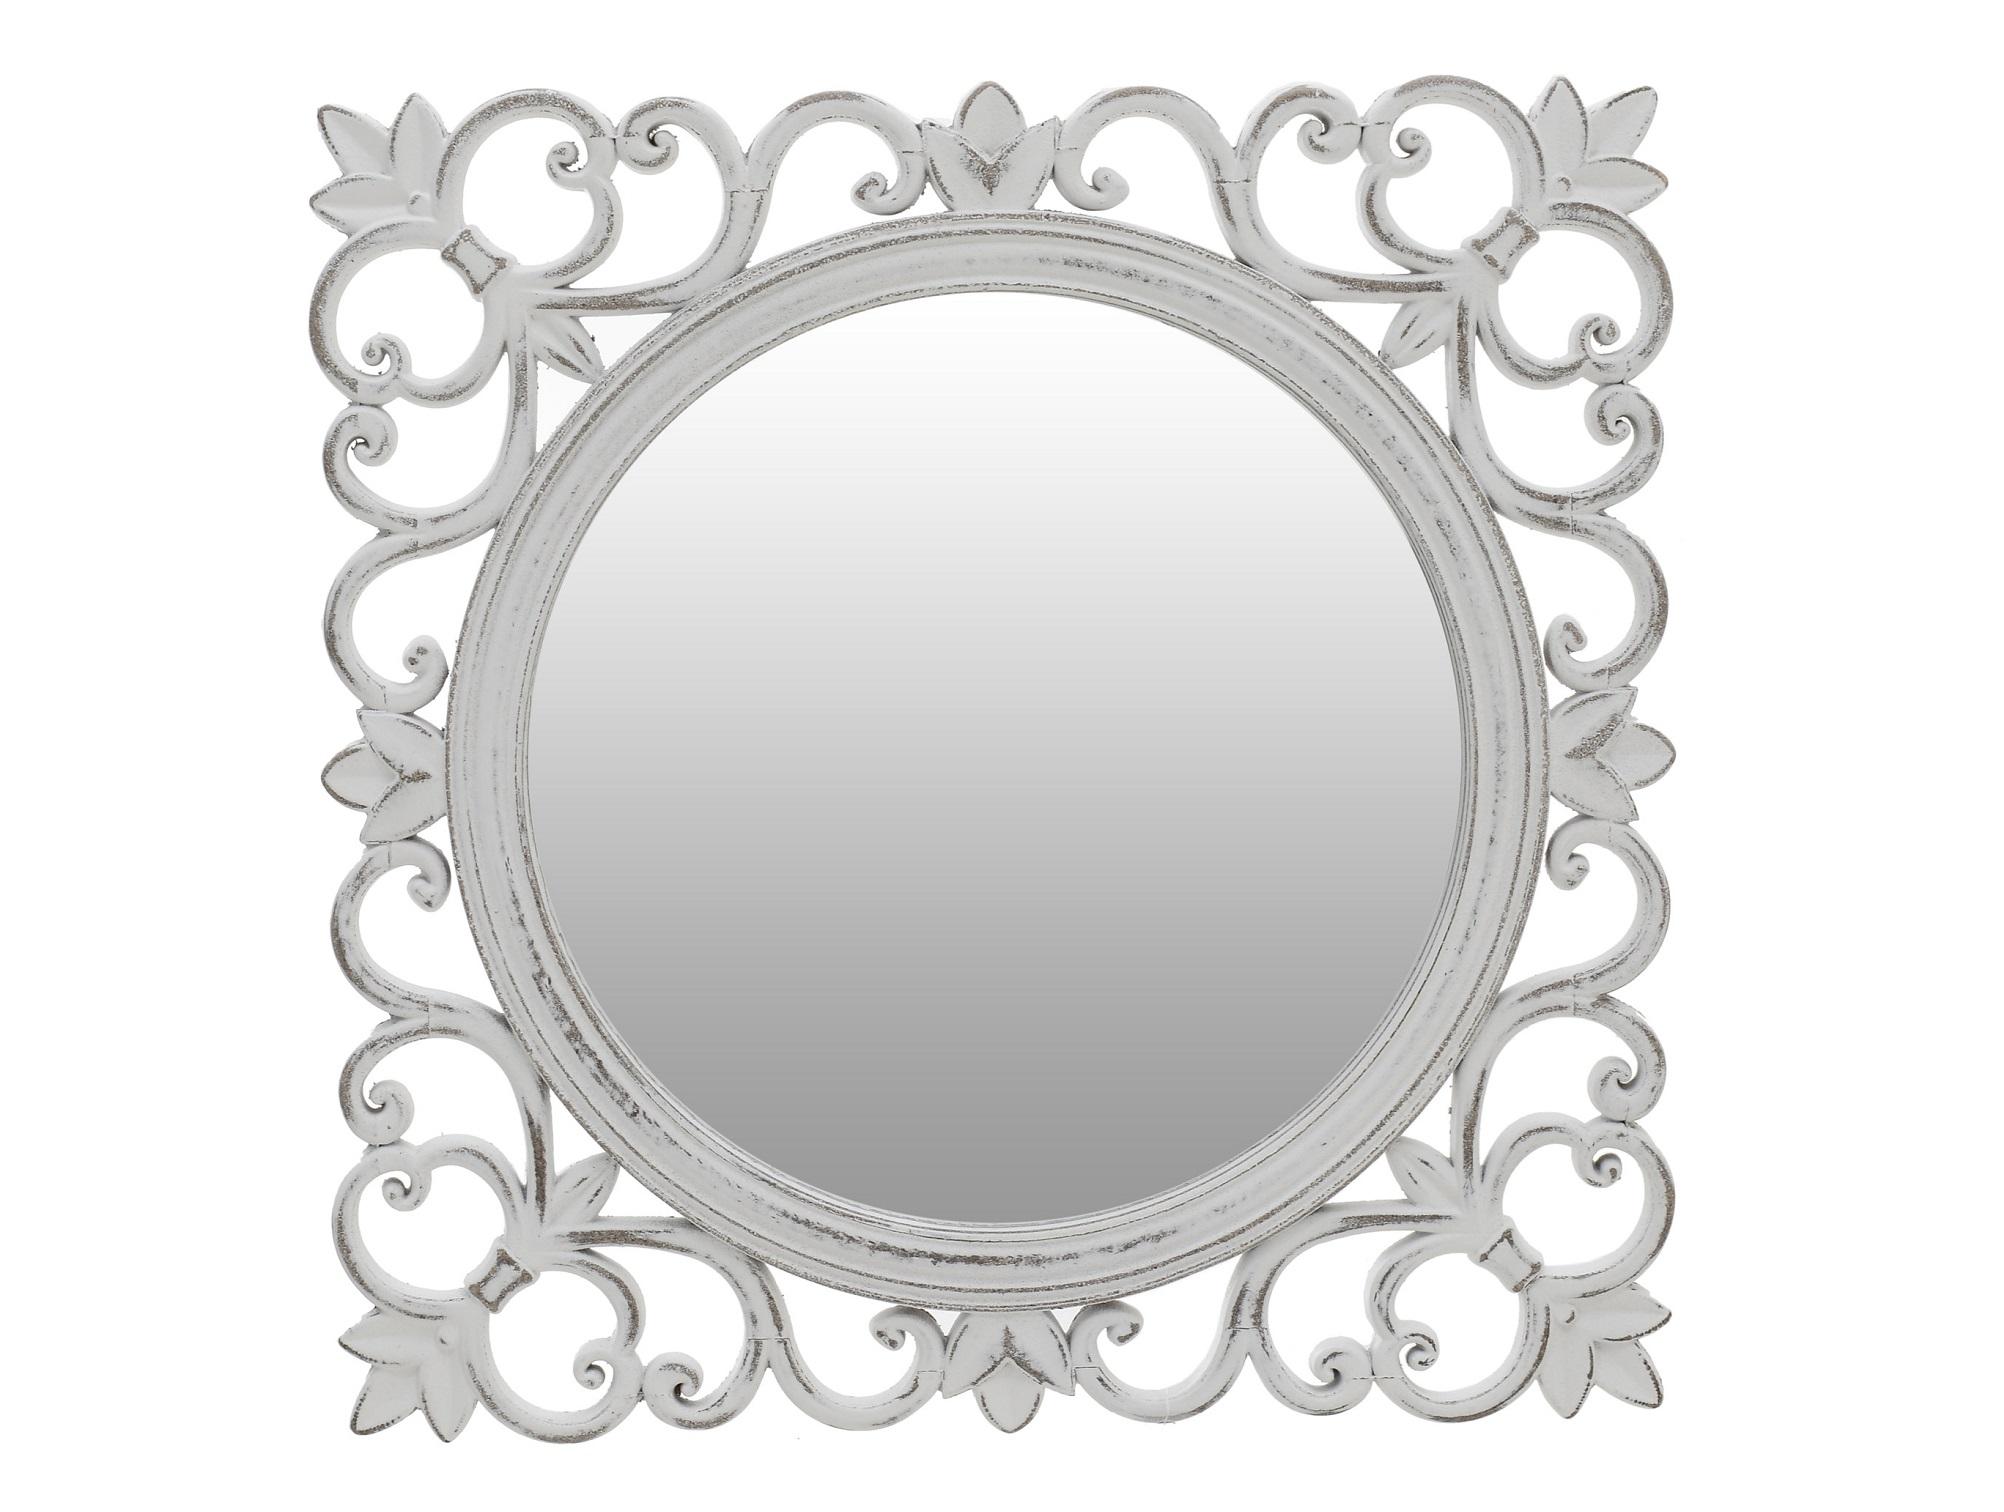 Зеркало настенное MalikНастенные зеркала<br><br><br>Material: Пластик<br>Ширина см: 29.0<br>Высота см: 29.0<br>Глубина см: 2.0